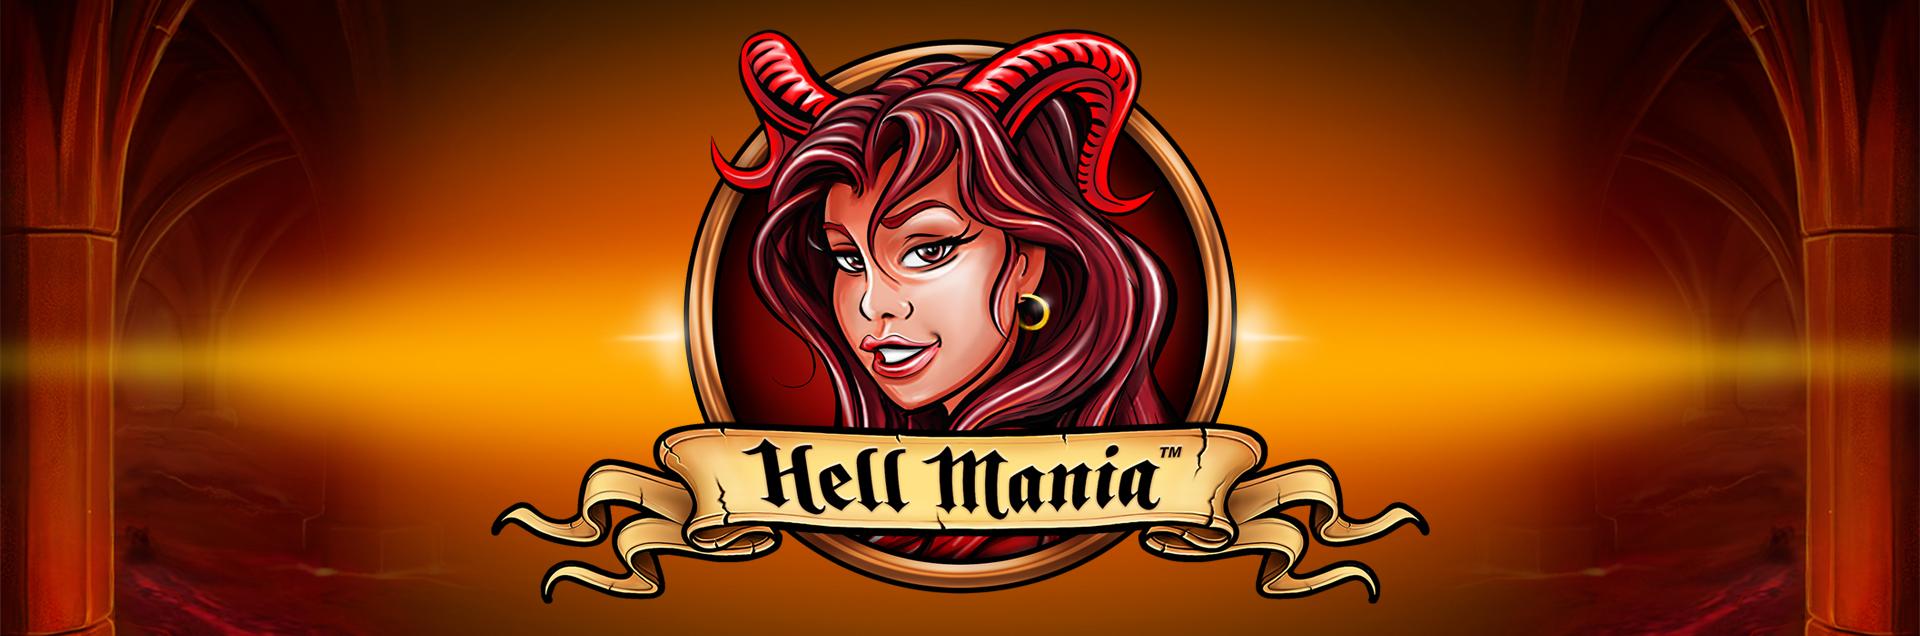 HellMania logo